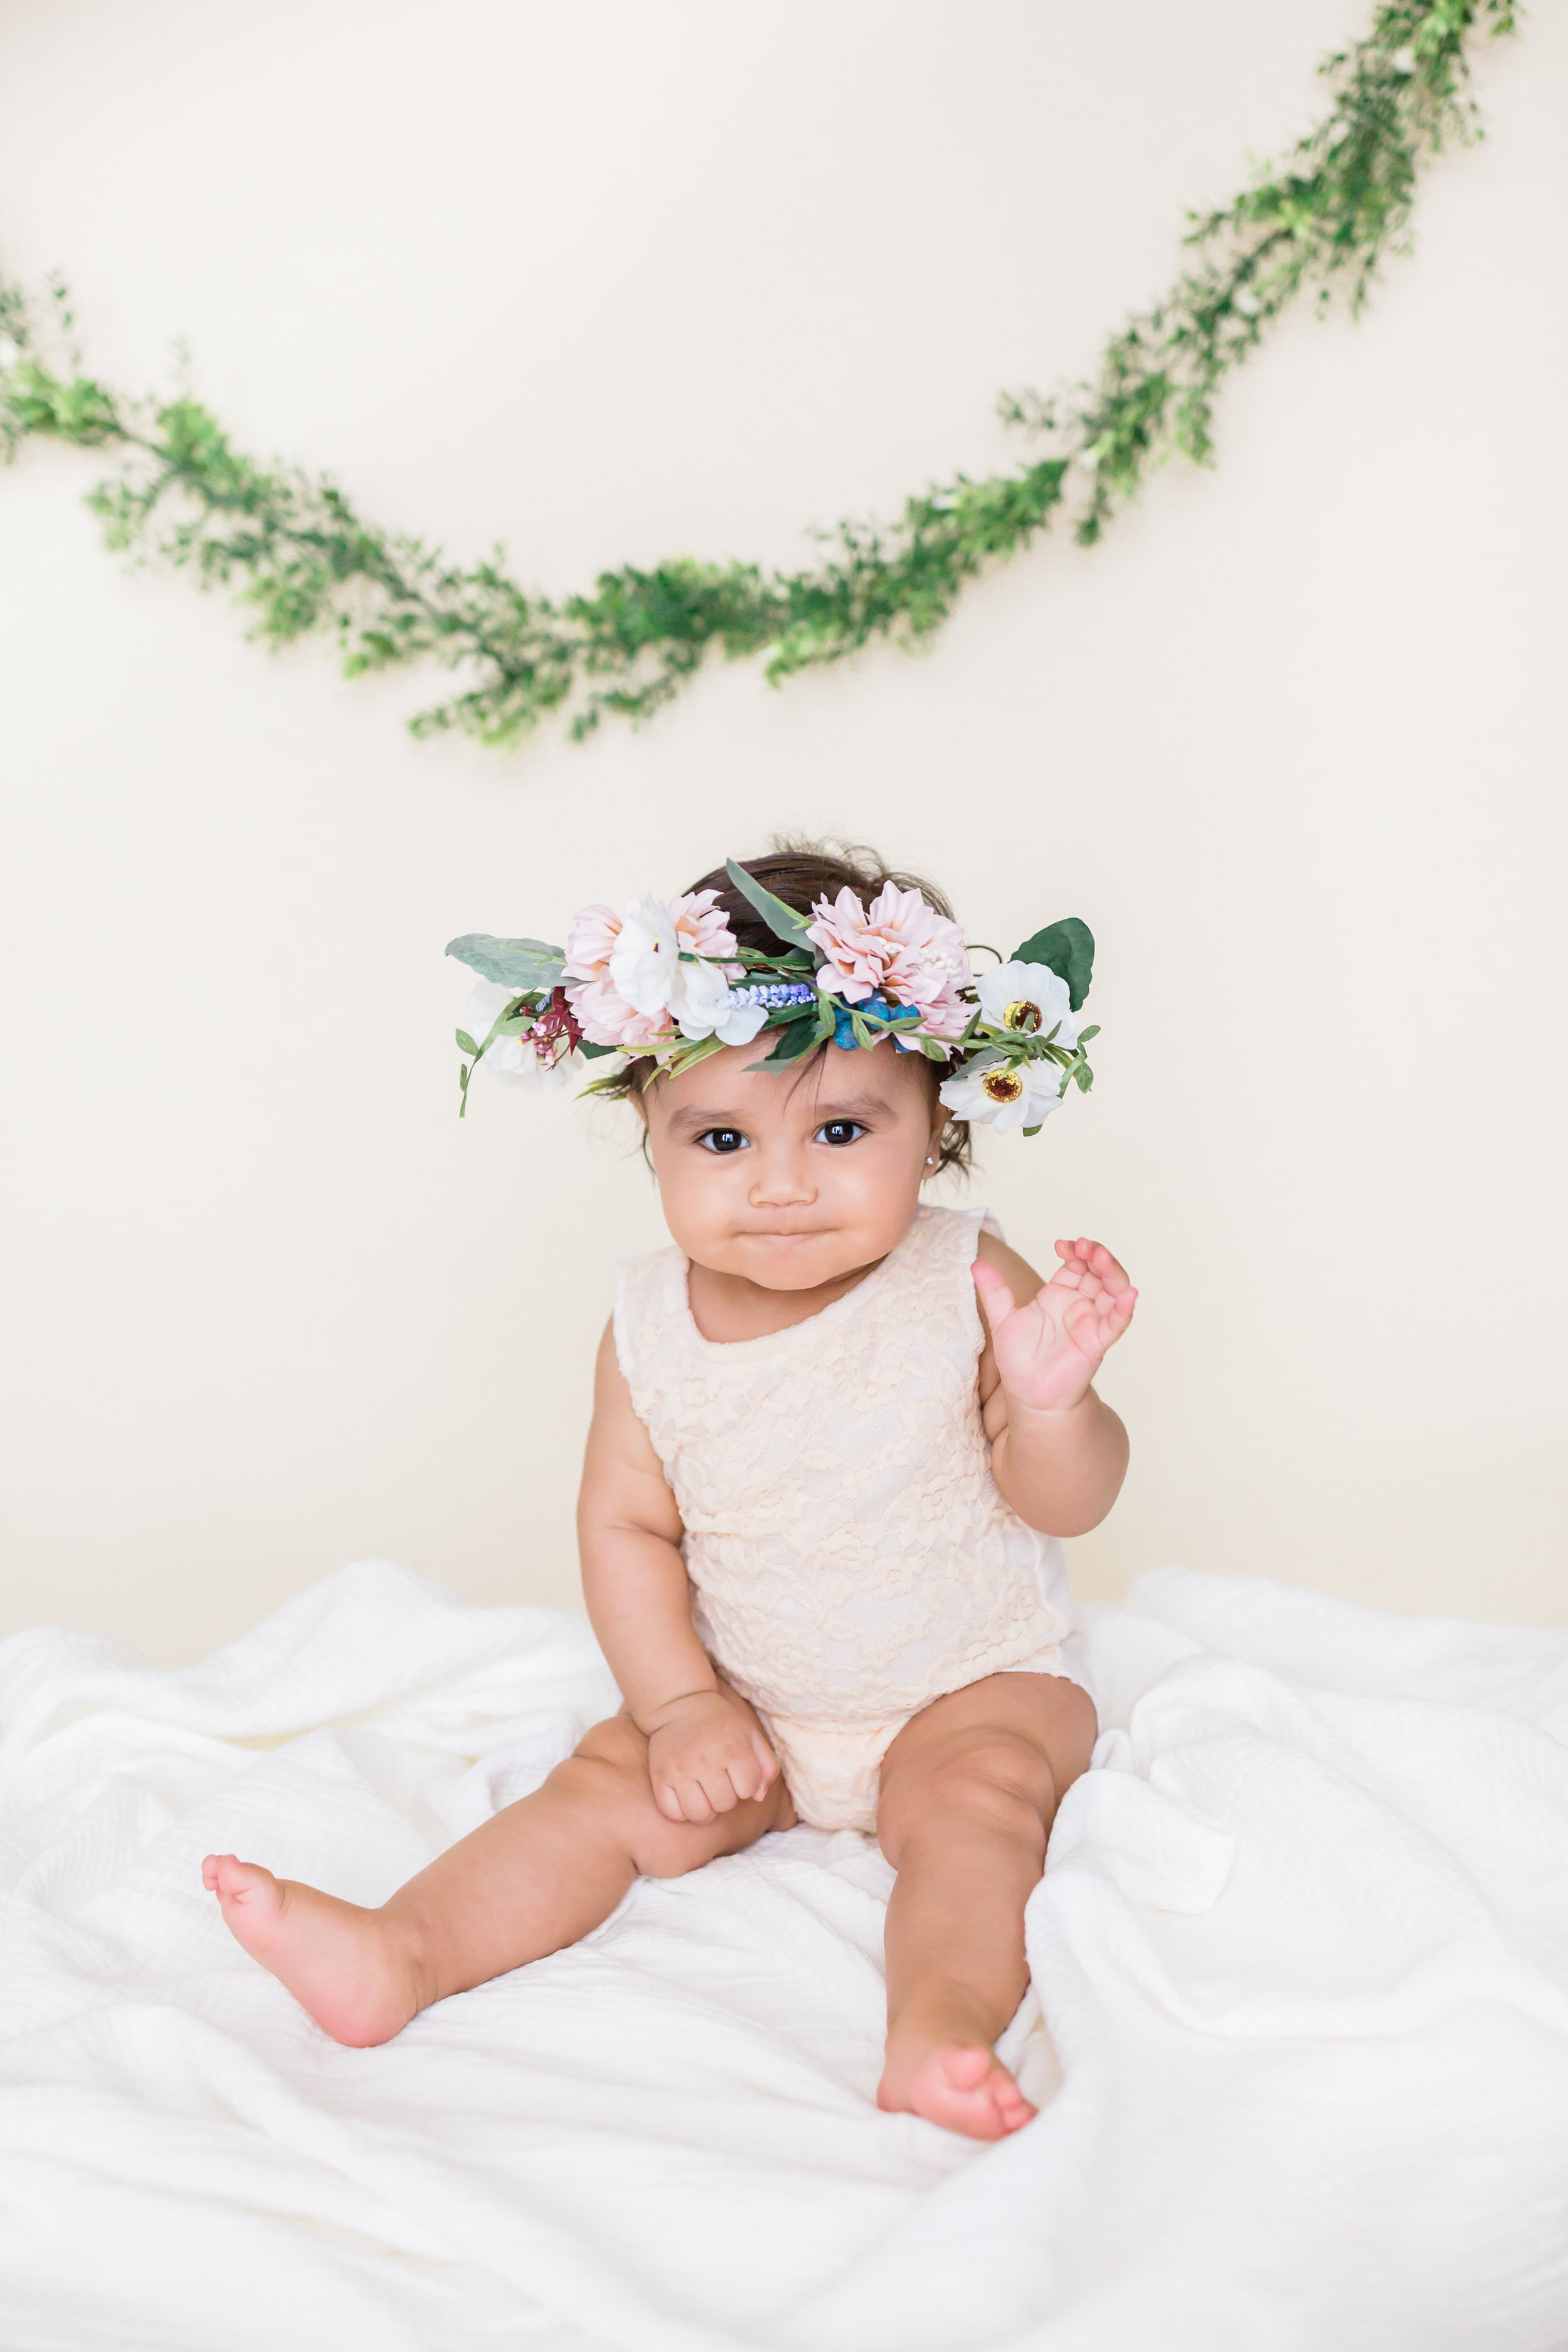 Sophia s 6 Month Session-Sophia-0004.jpg